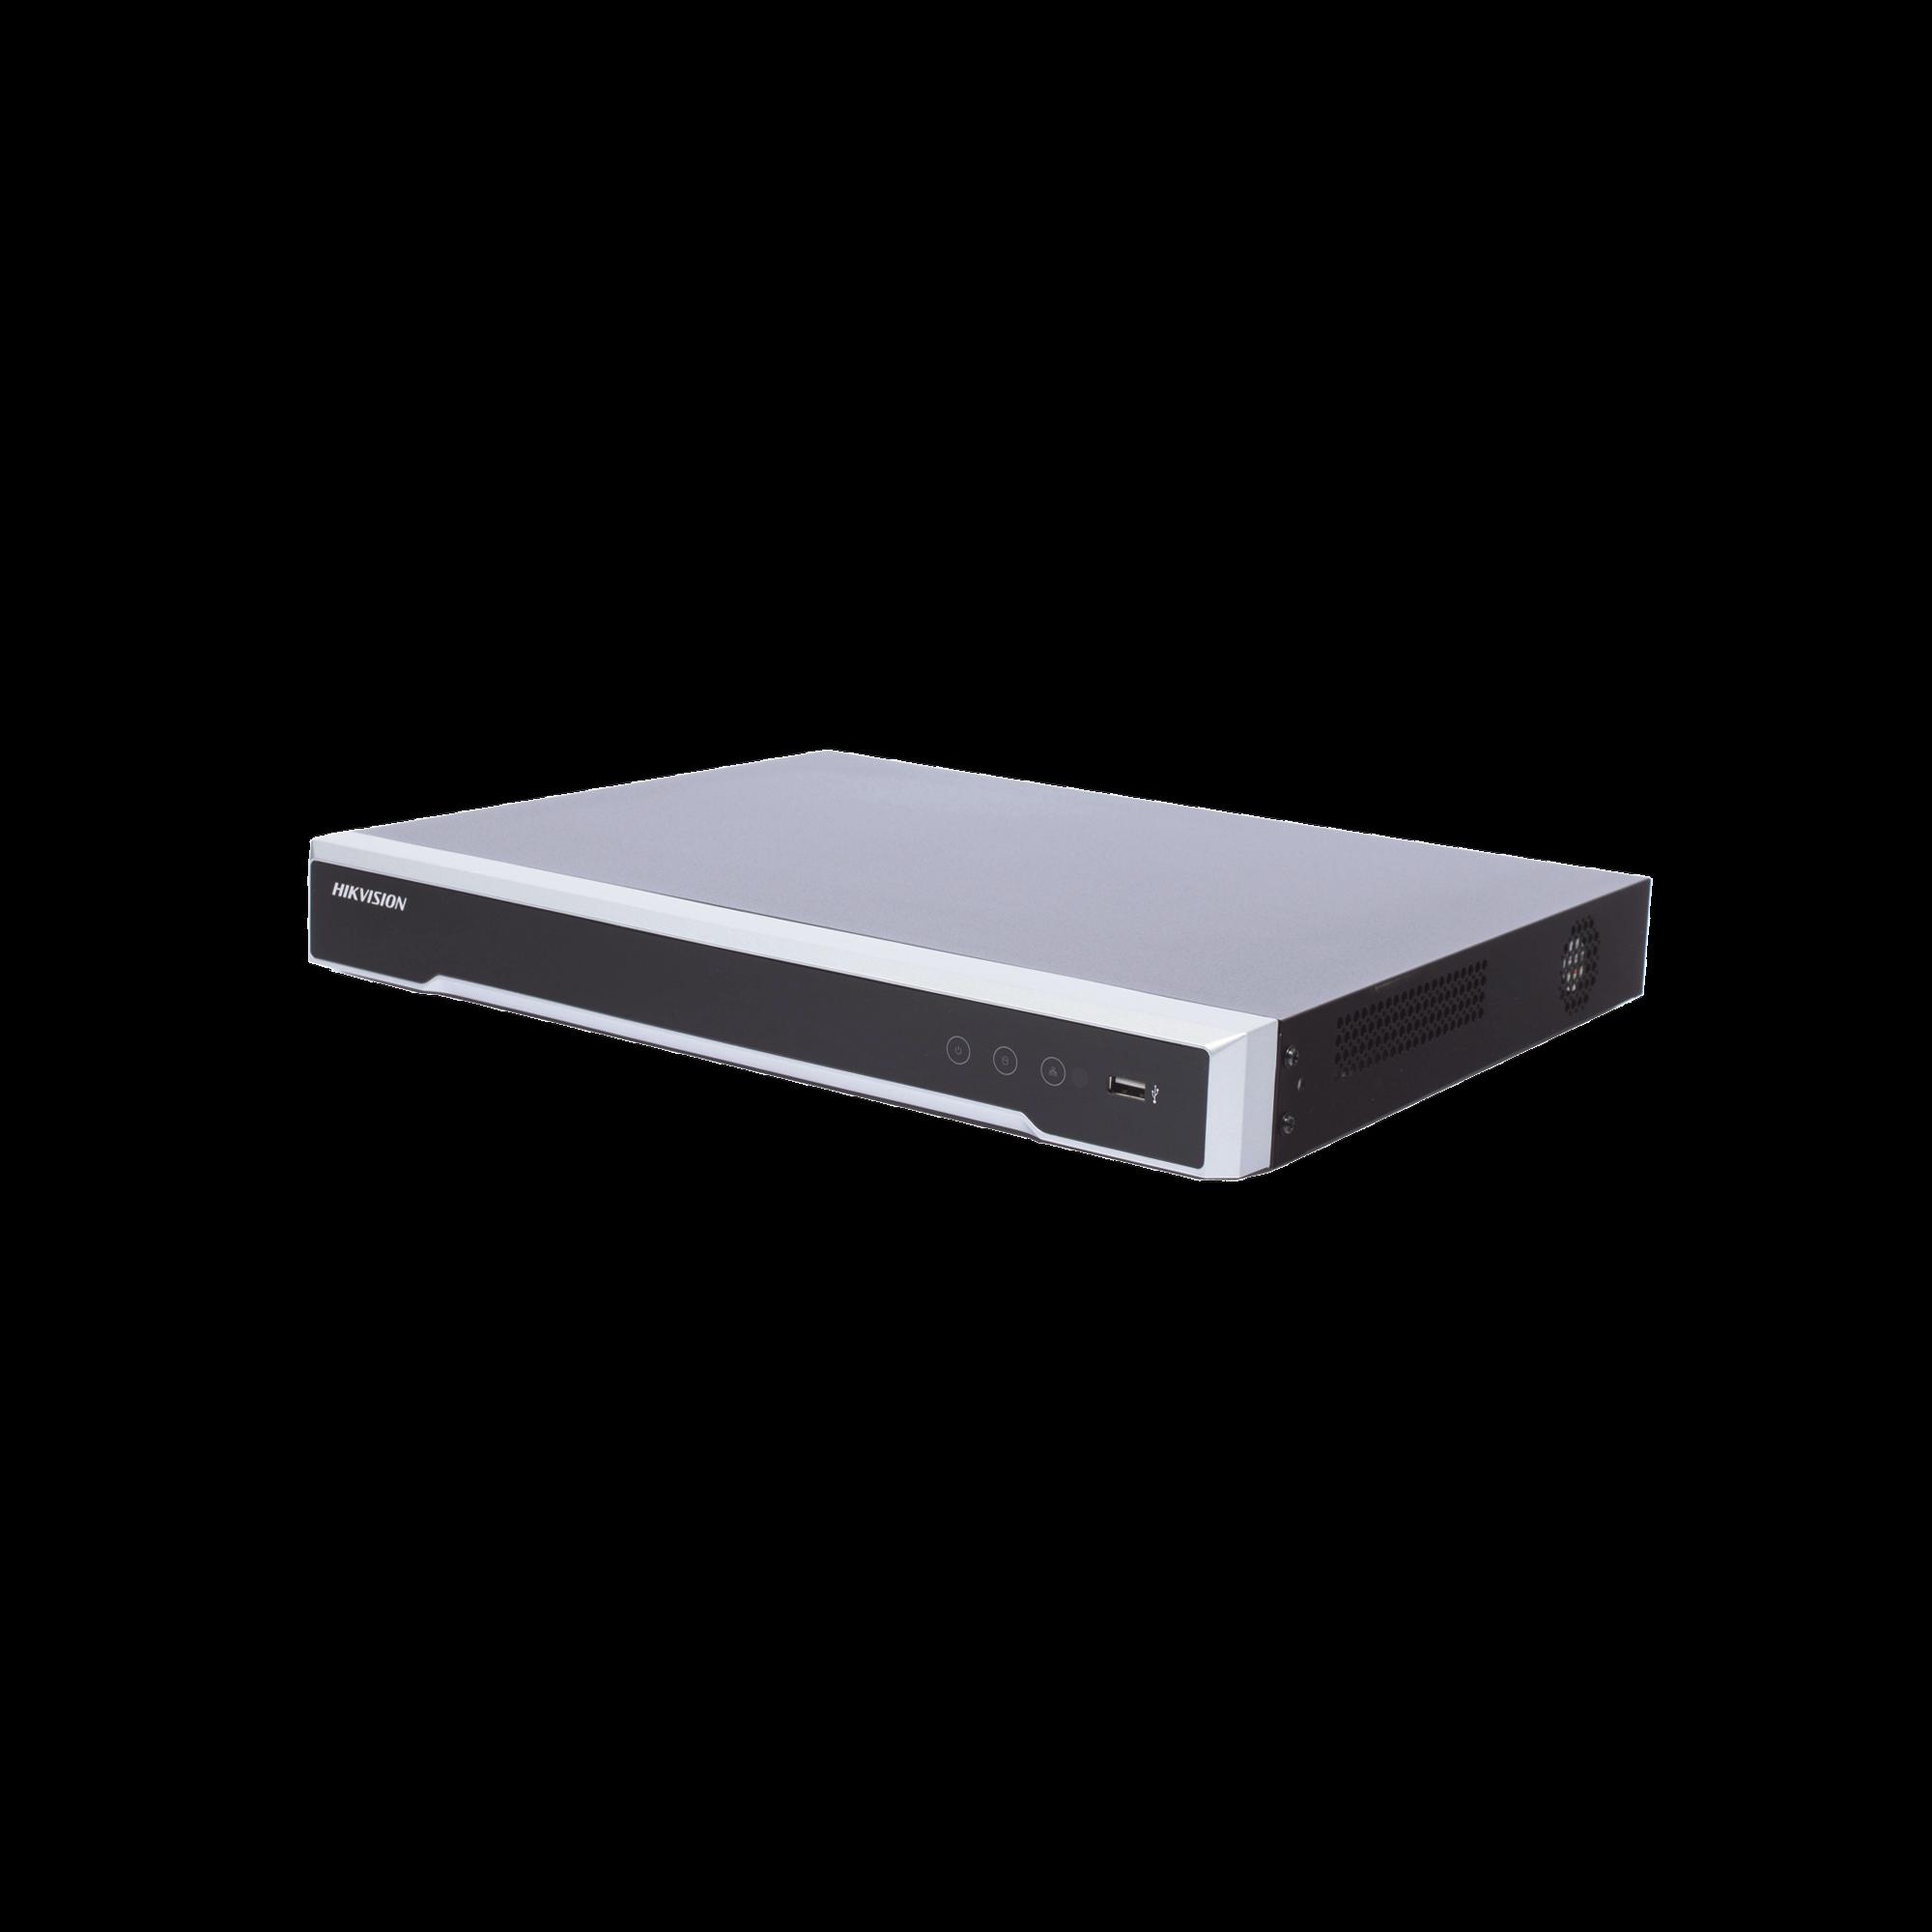 NVR 8 Megapixel (4K) / 16 canales IP / 2 Bahias de Disco Duro / HDMI en 4K